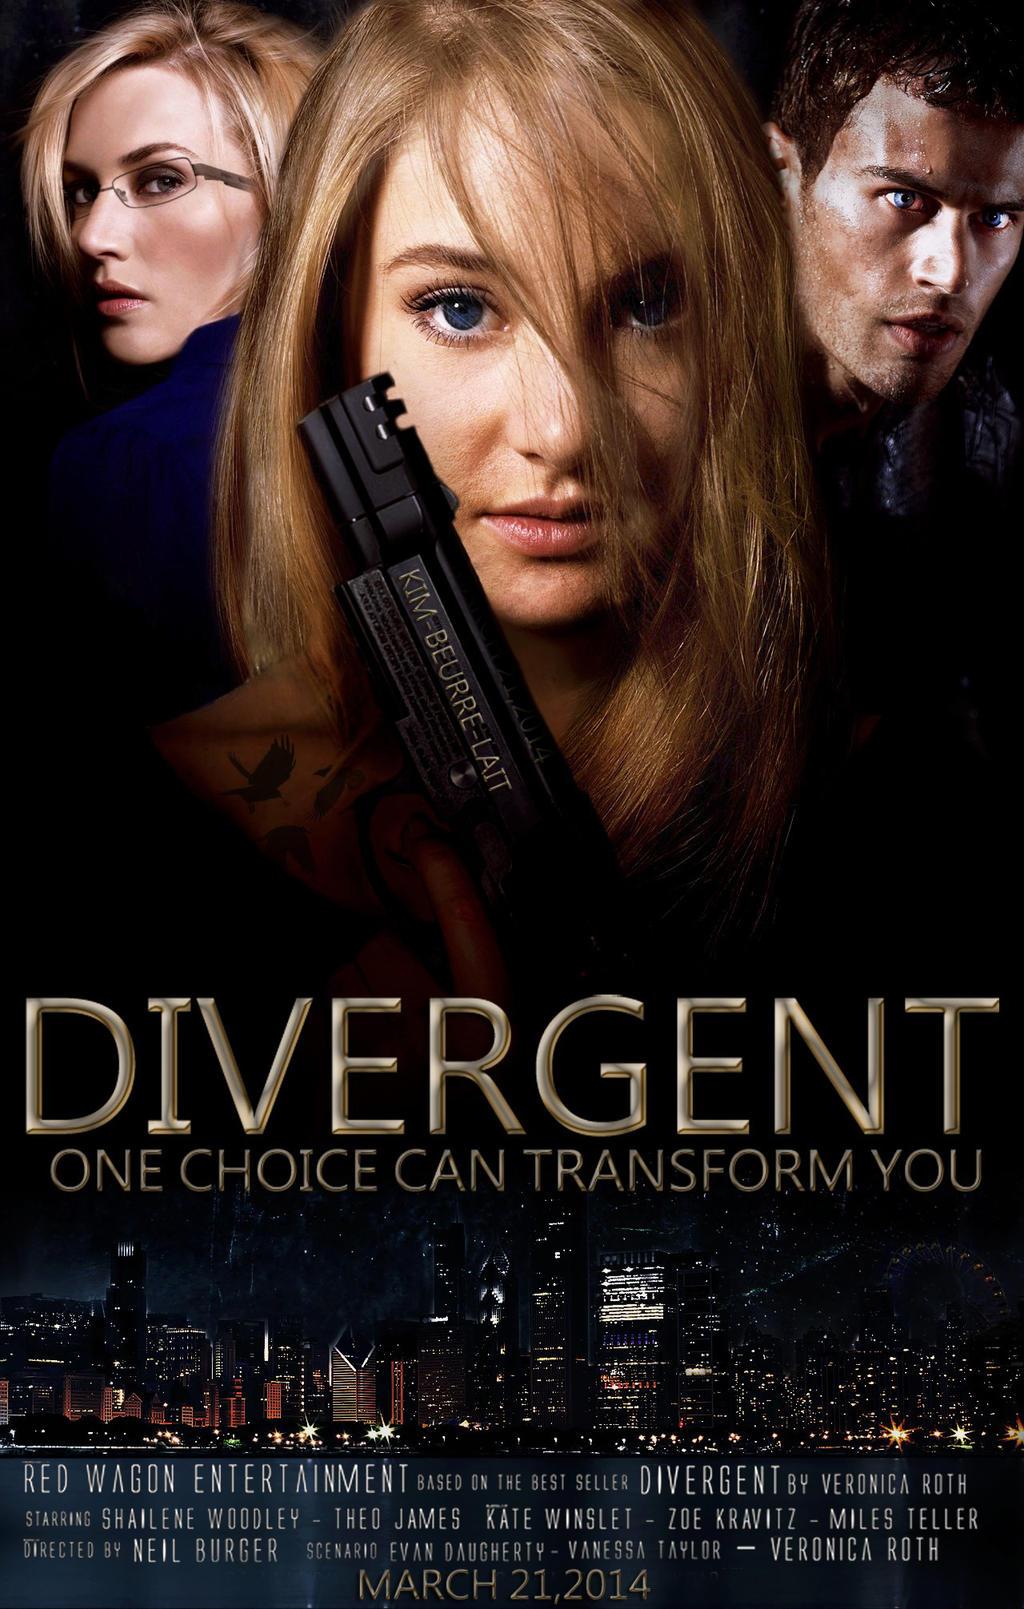 Divergent Fan Made Poster by kim-beurre-lait on DeviantArt